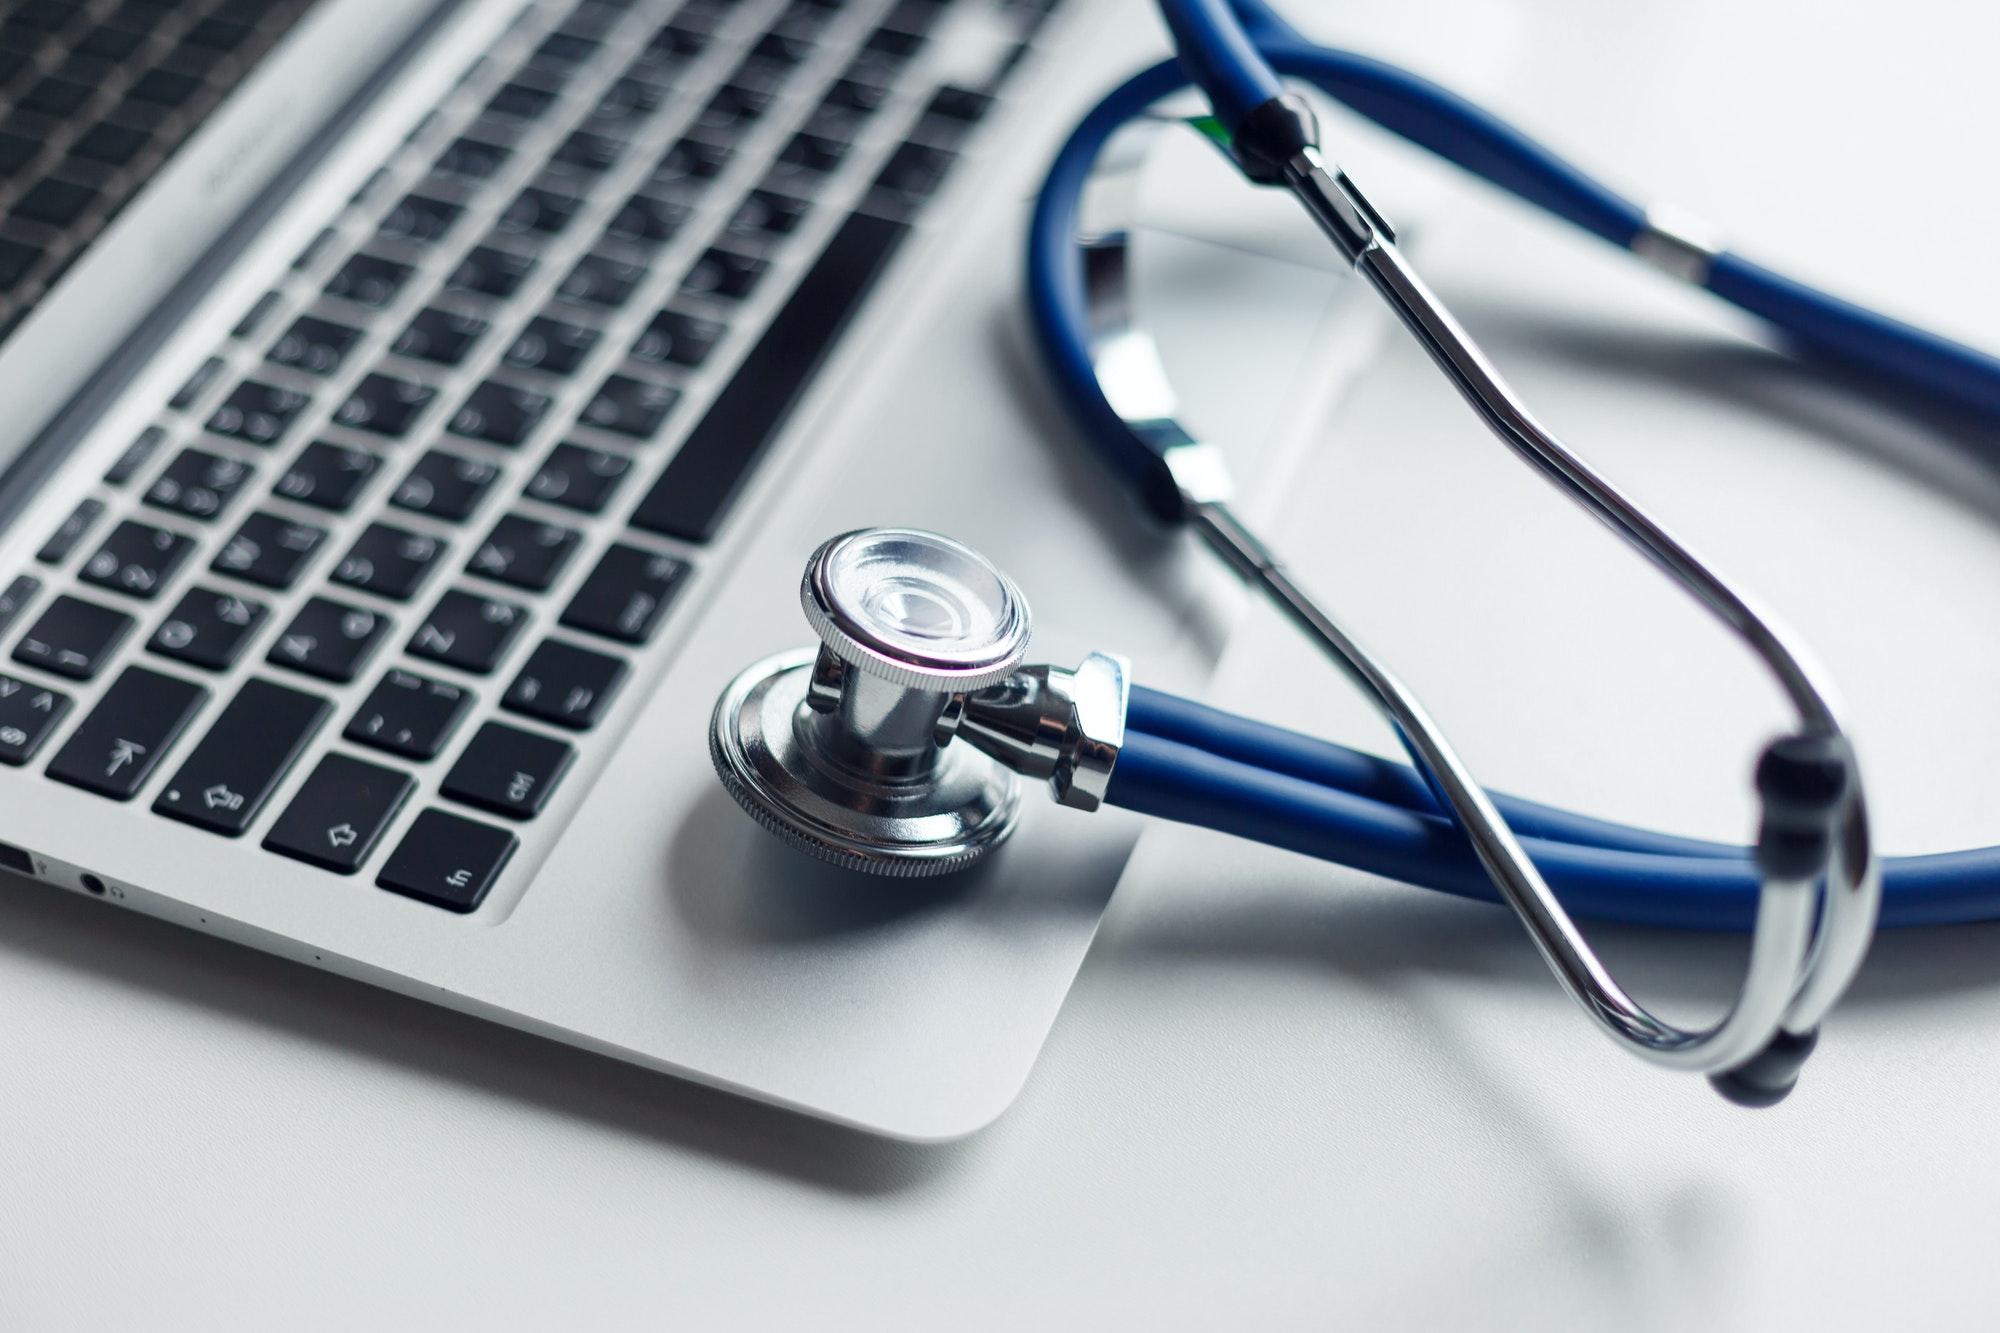 Stethoscope on laptop keyboard. Medicine concept